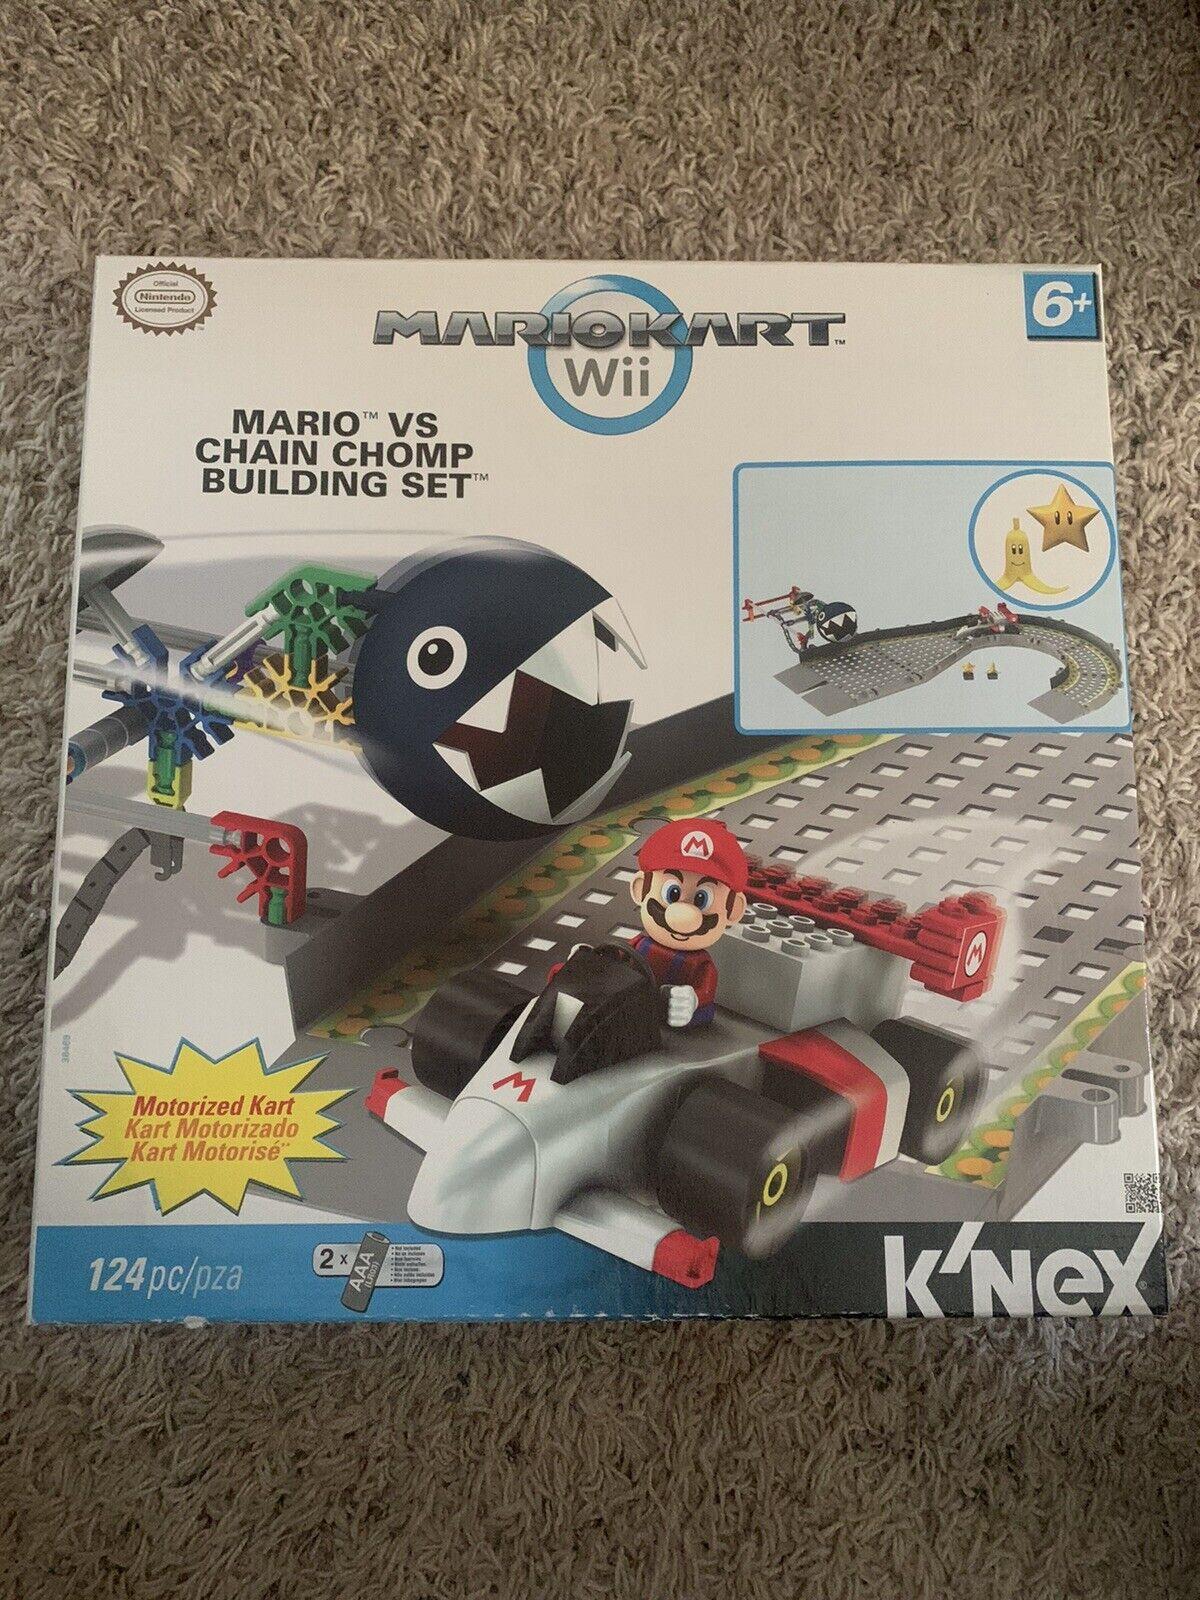 K/'NEX Super Mario Mario Kart Wii Mario vs Chain Chomp Set #38469